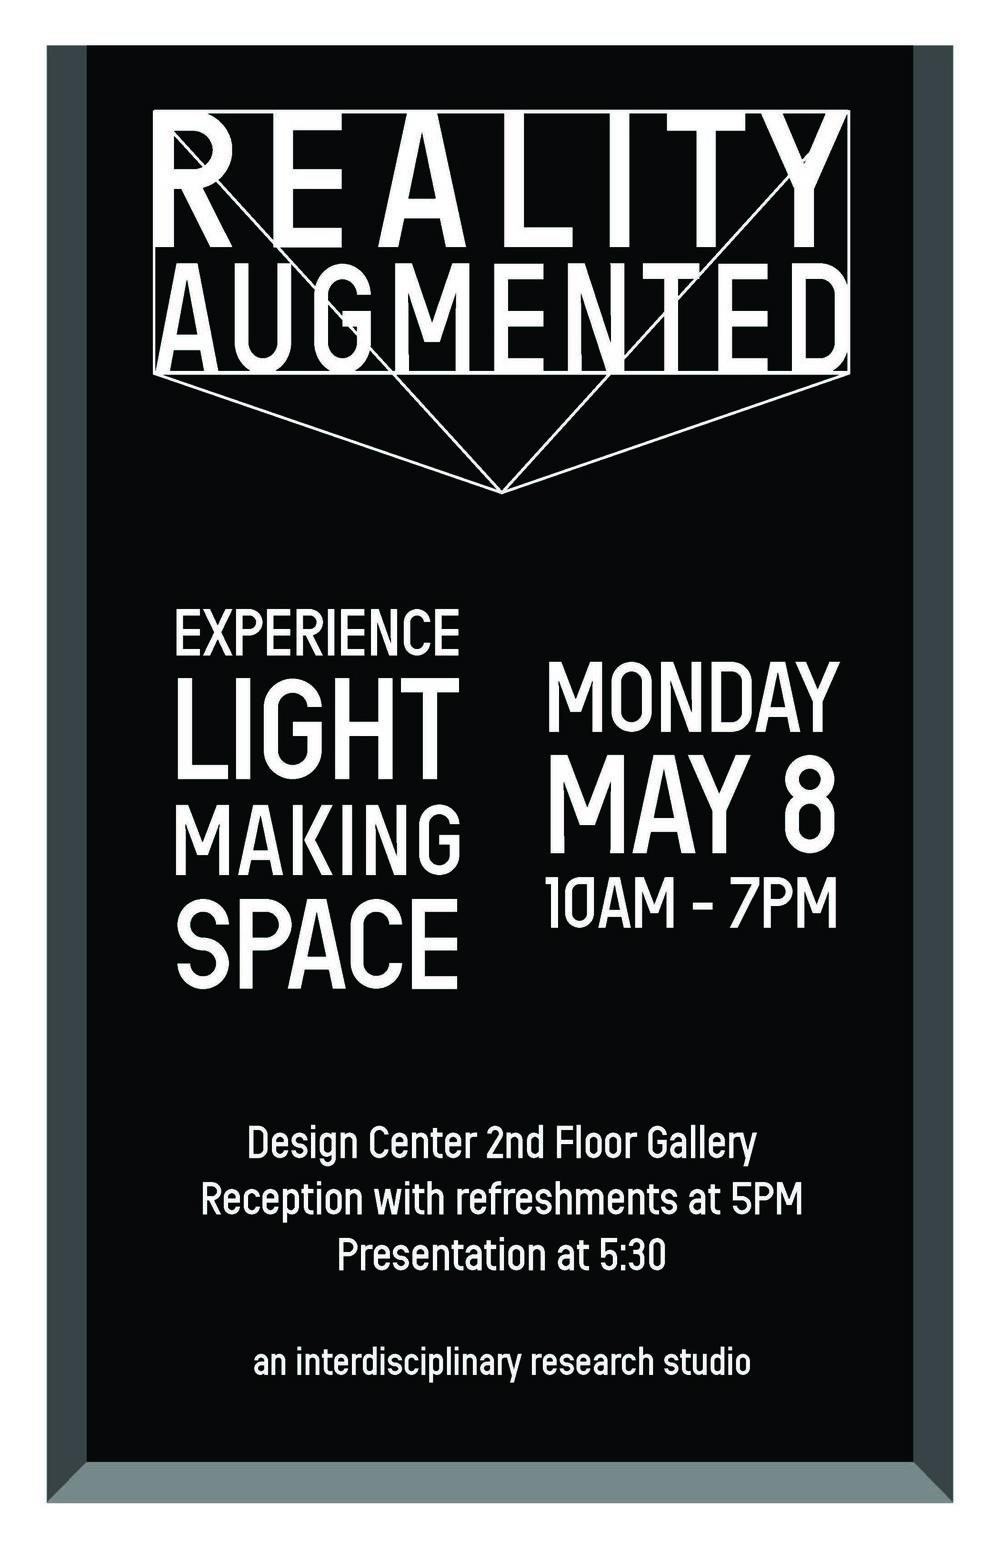 Reality Augmented Show Spring 2017 - LIGHTING-SPRING17.jpg